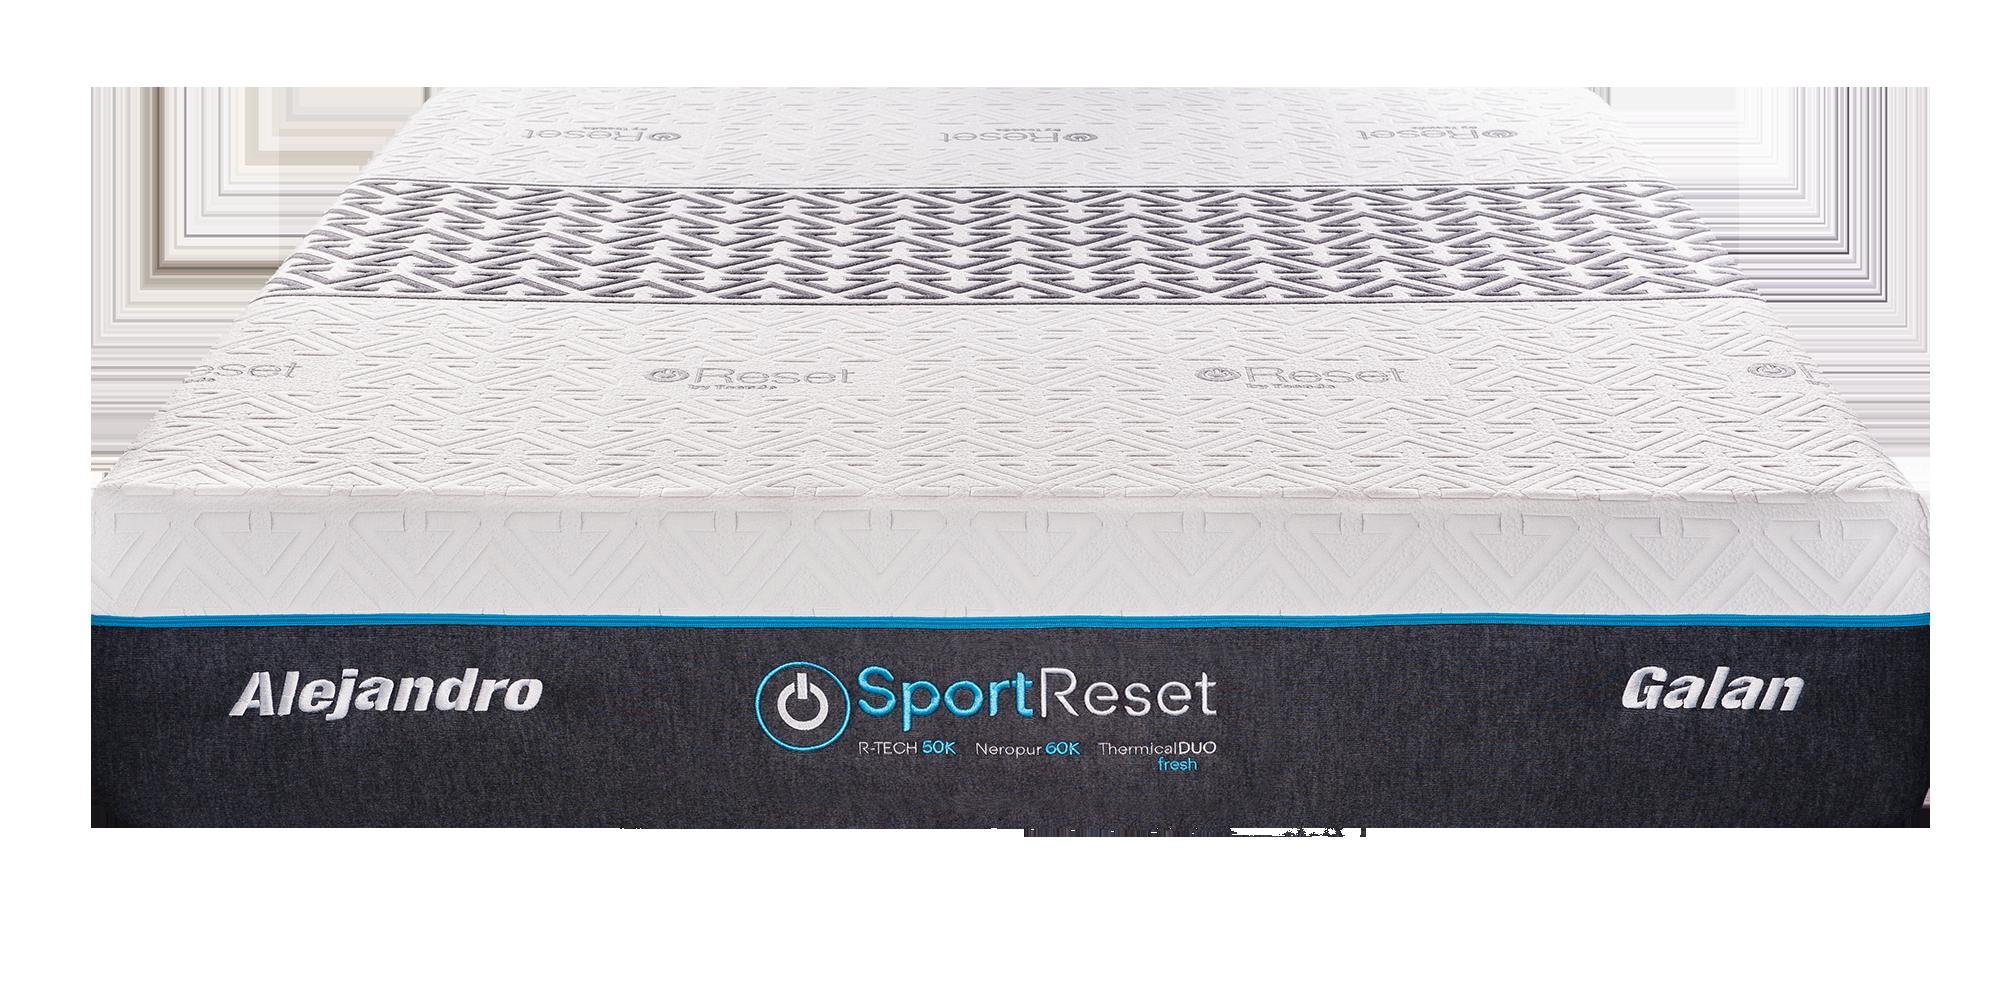 Colchon Sport Reset frontal sin sombra web